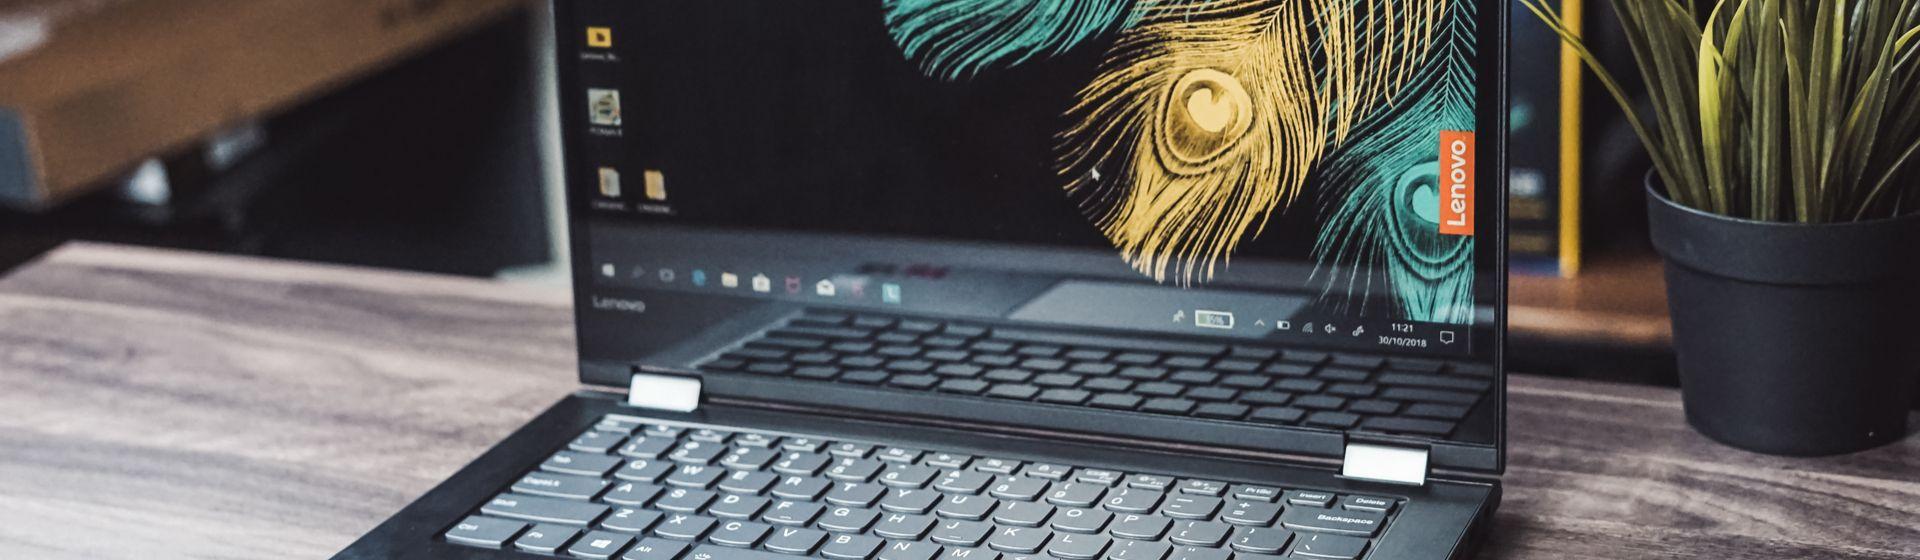 Lenovo atualiza notebooks ThinkPad P14S e P15S para 2020; confira